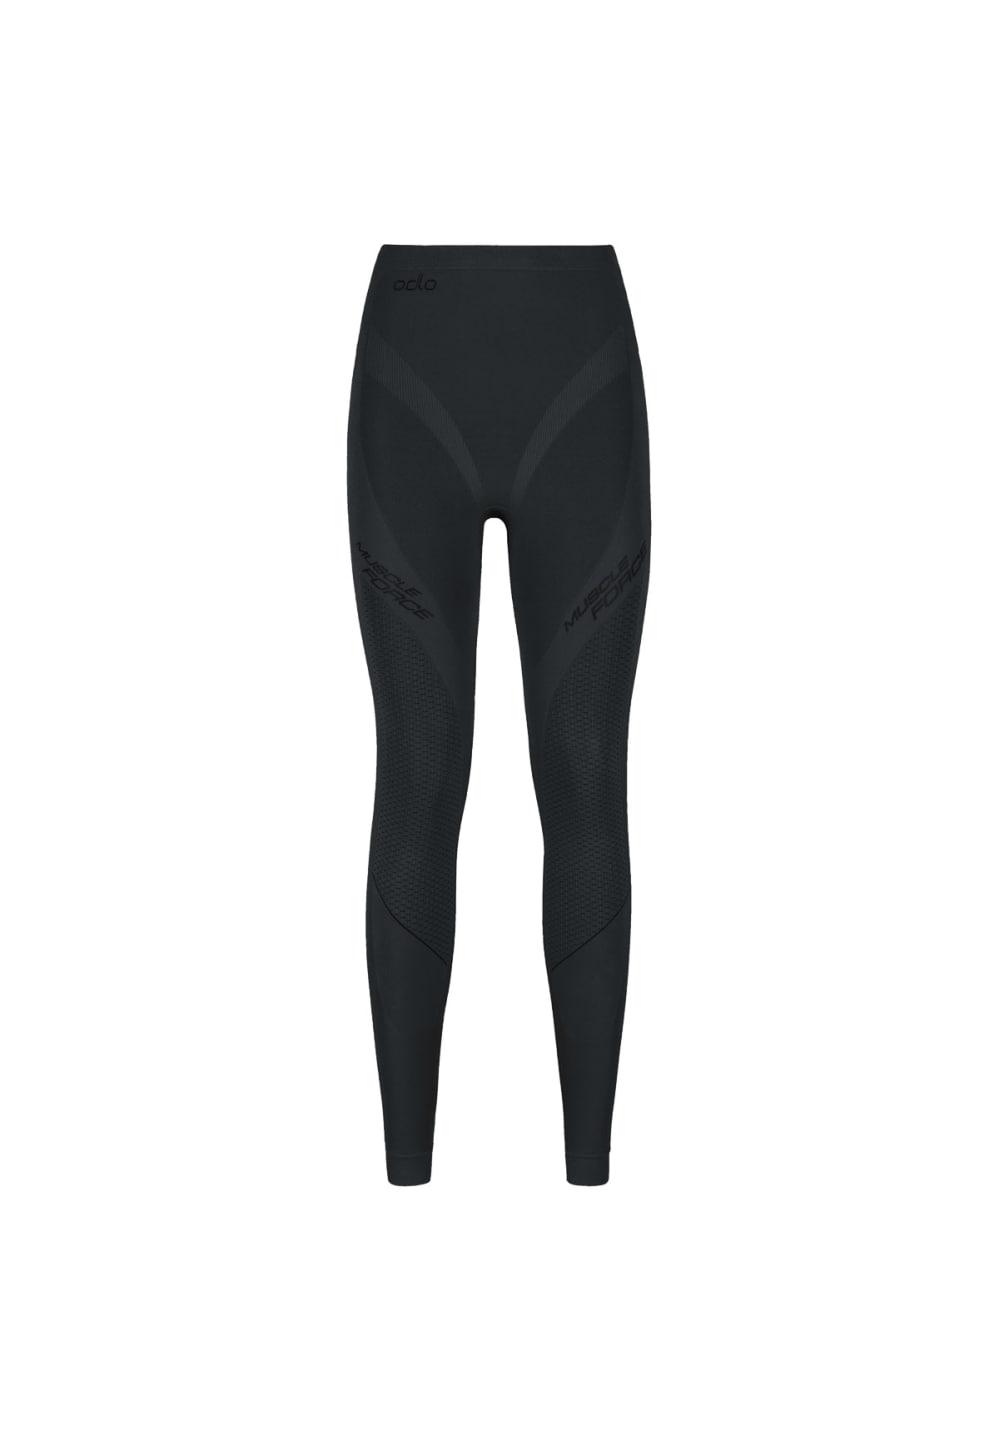 Odlo Pants Evolution Warm Muscle Force - Funktionsunterwäsche für Damen - Schw